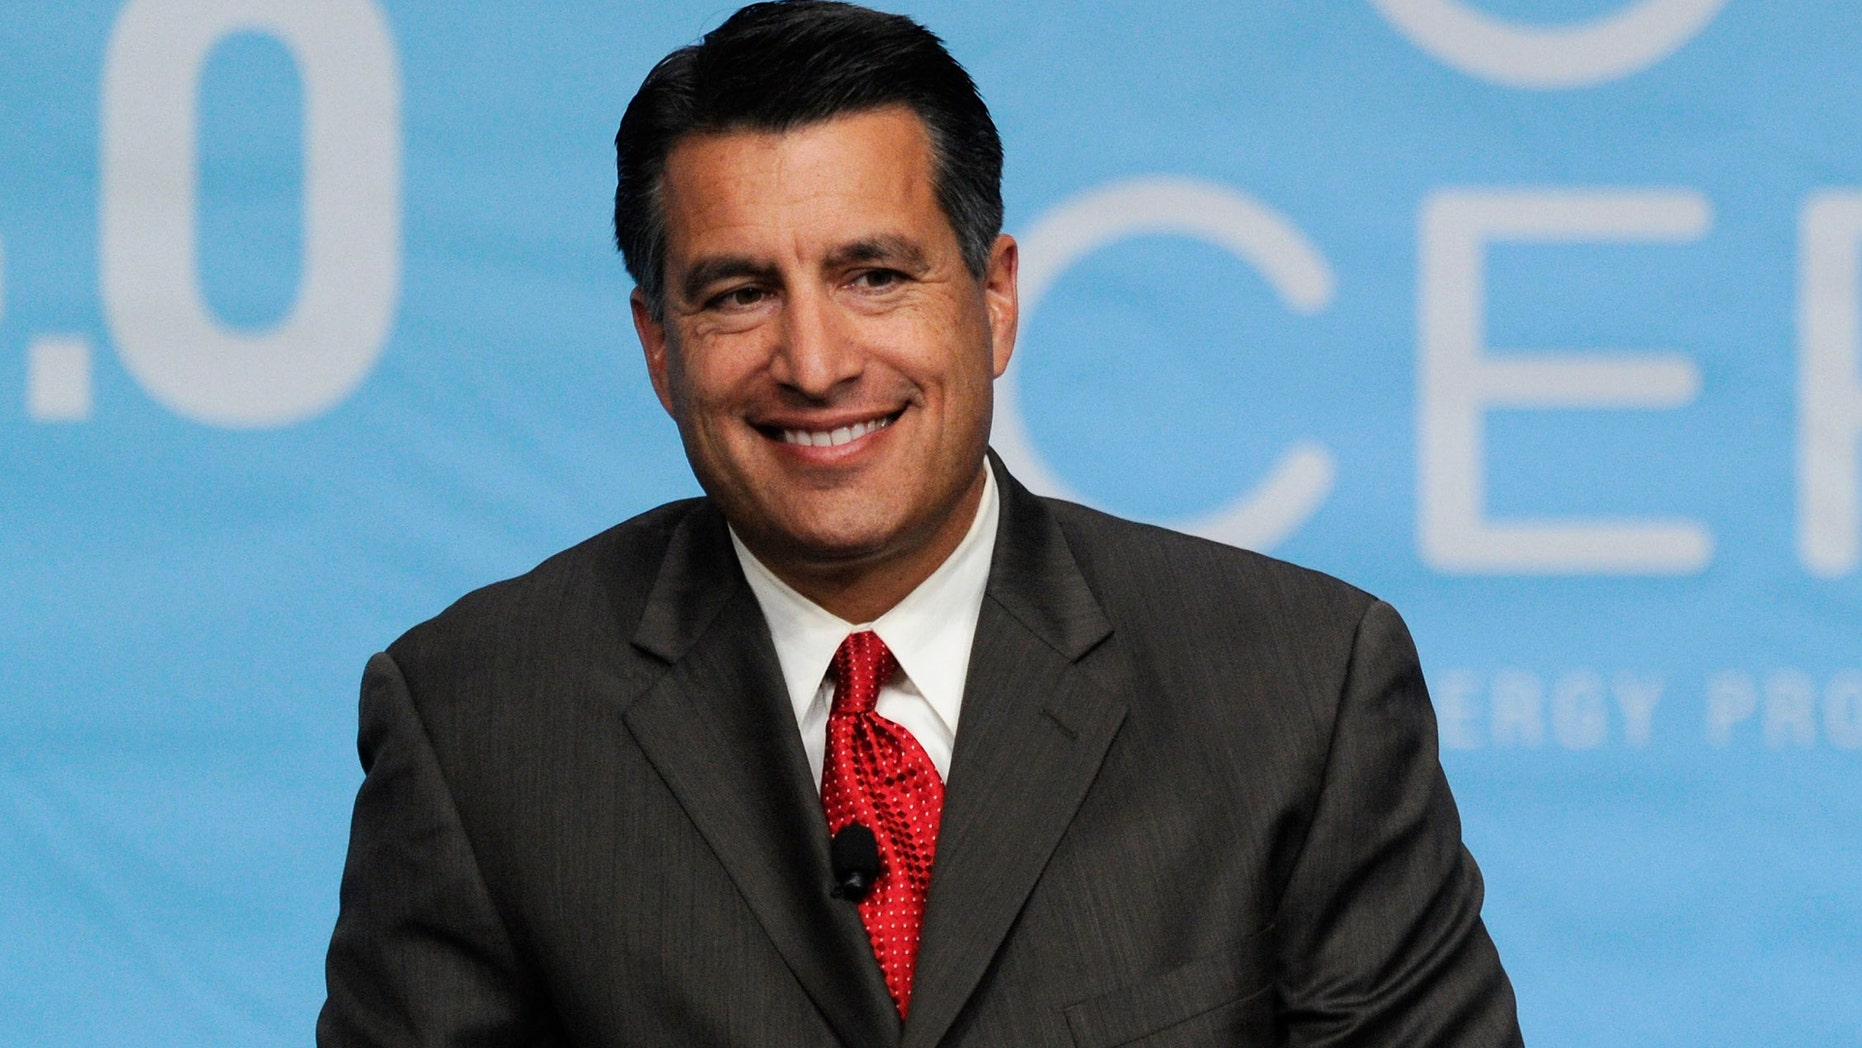 Nevada Gov. Brian Sandoval in a 2011 file photo.